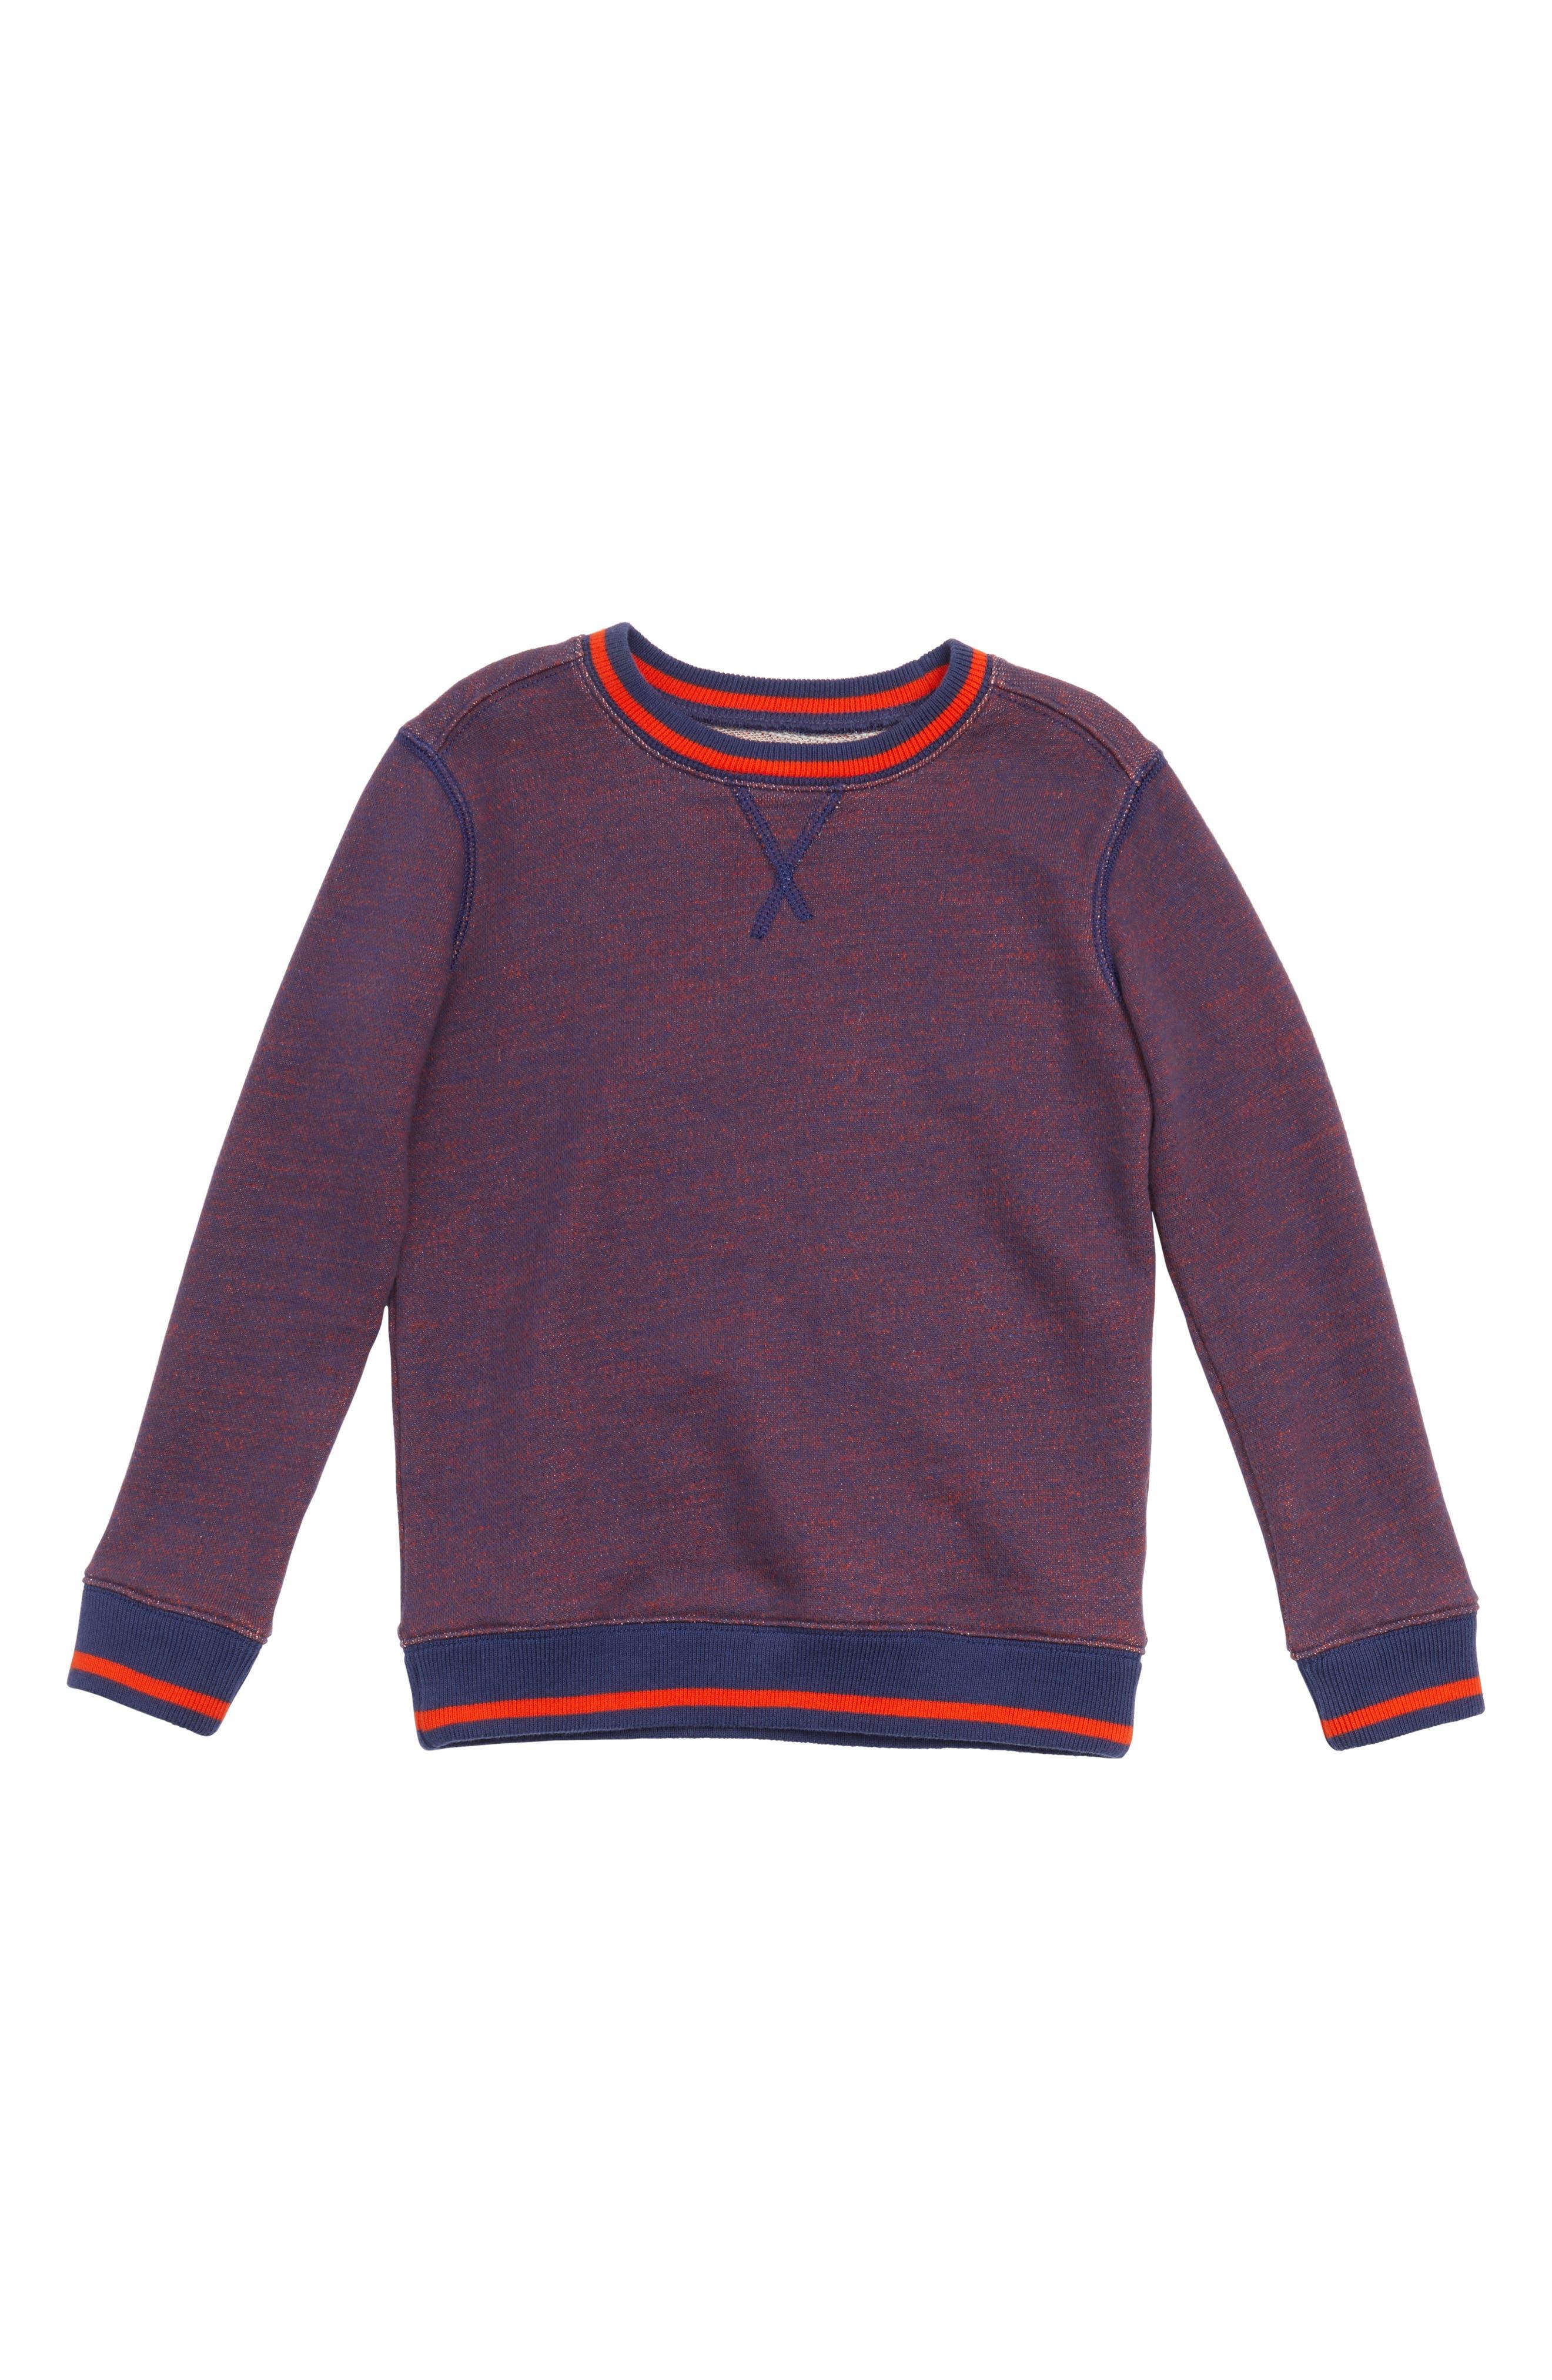 Crewneck Sweatshirt,                             Main thumbnail 1, color,                             410